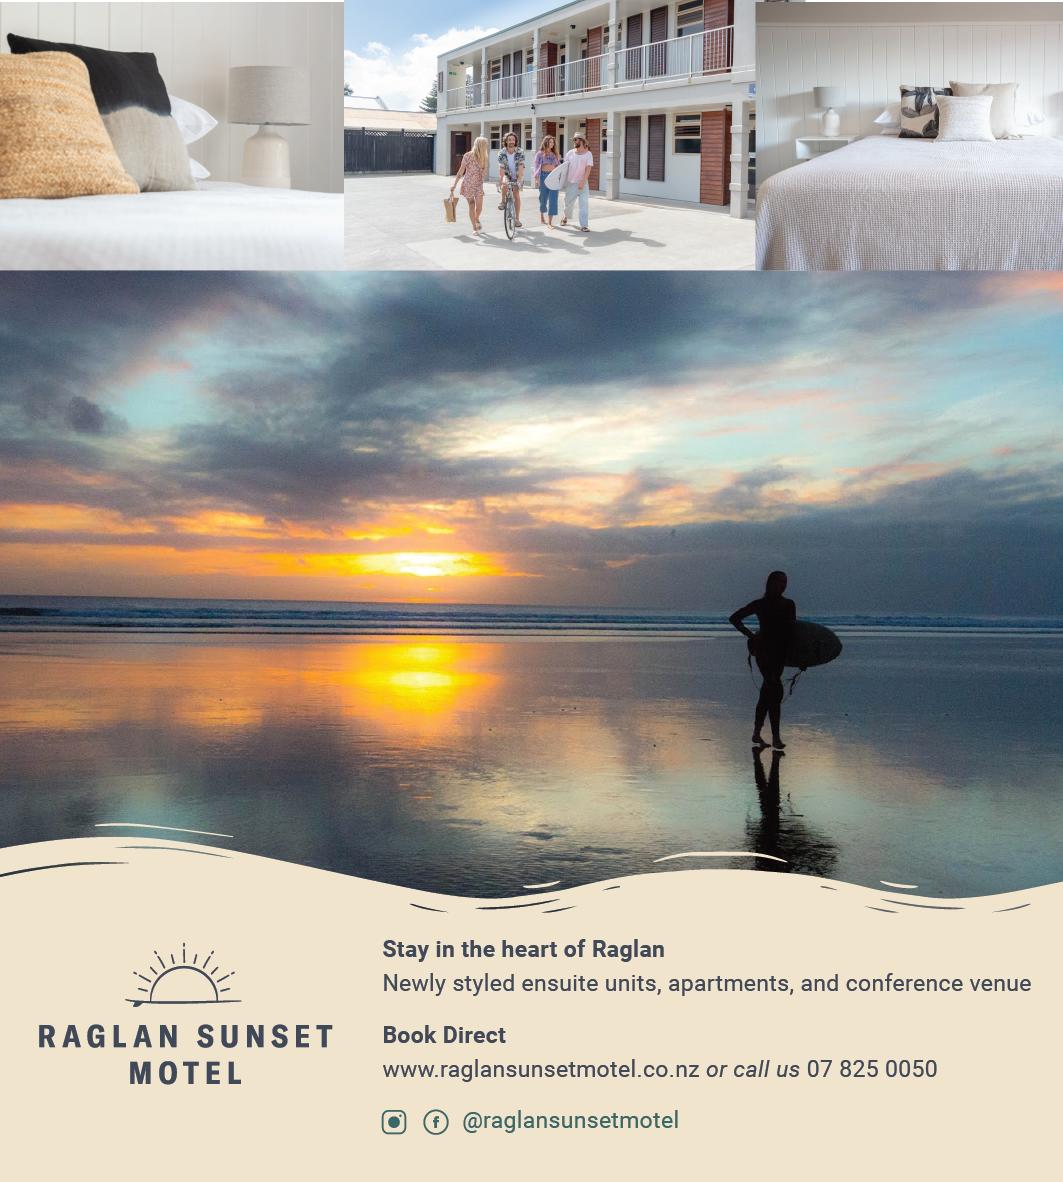 Sunset motel - latest ad